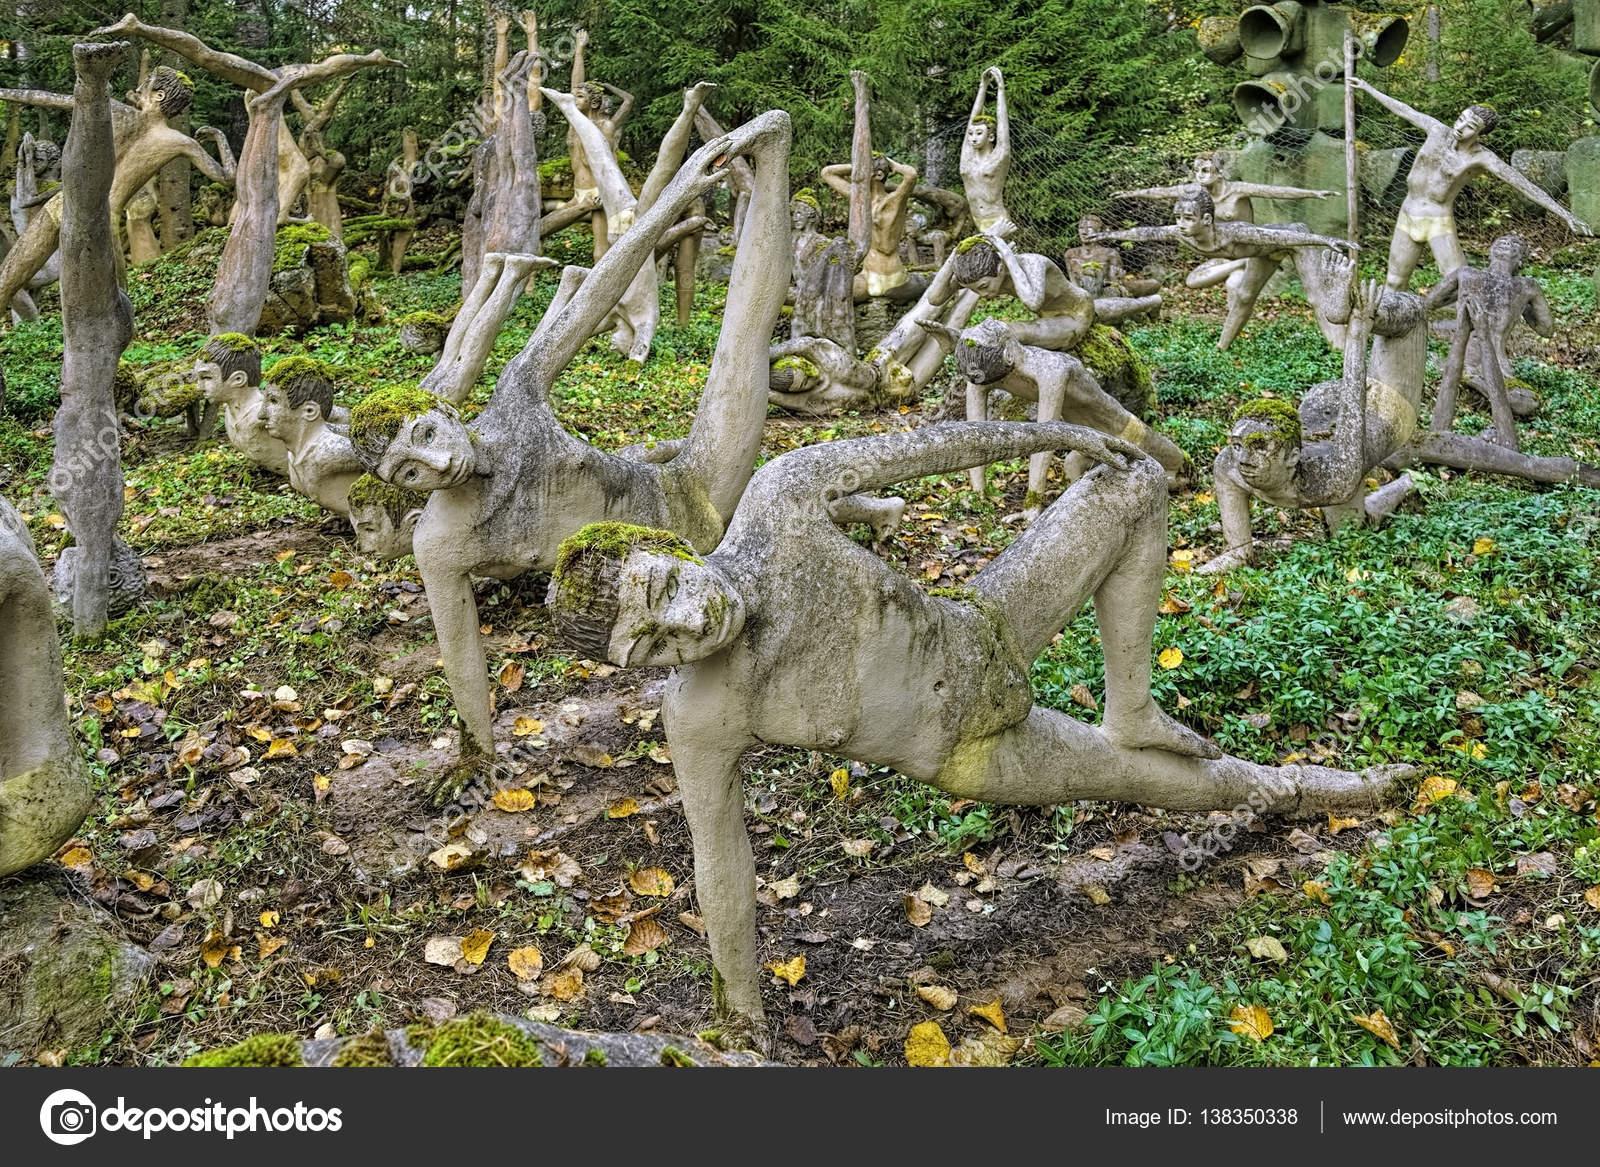 Yoga Garden In Parikkala Sculpture Park, Finland U2014 Stock Photo #138350338